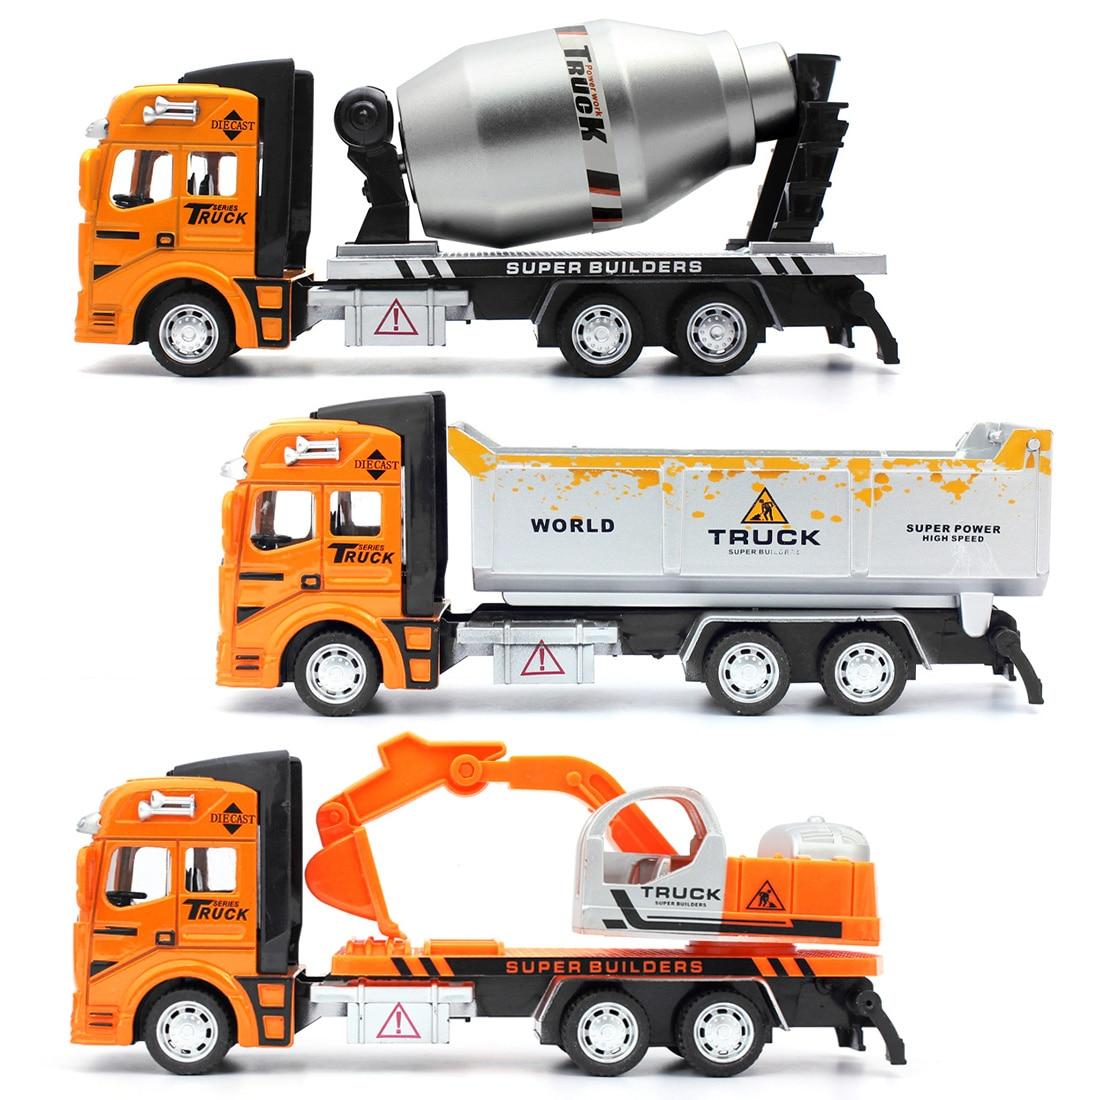 Pull Back Engineer Truck Educational Engineering Dump 1:48 Alloy for Children